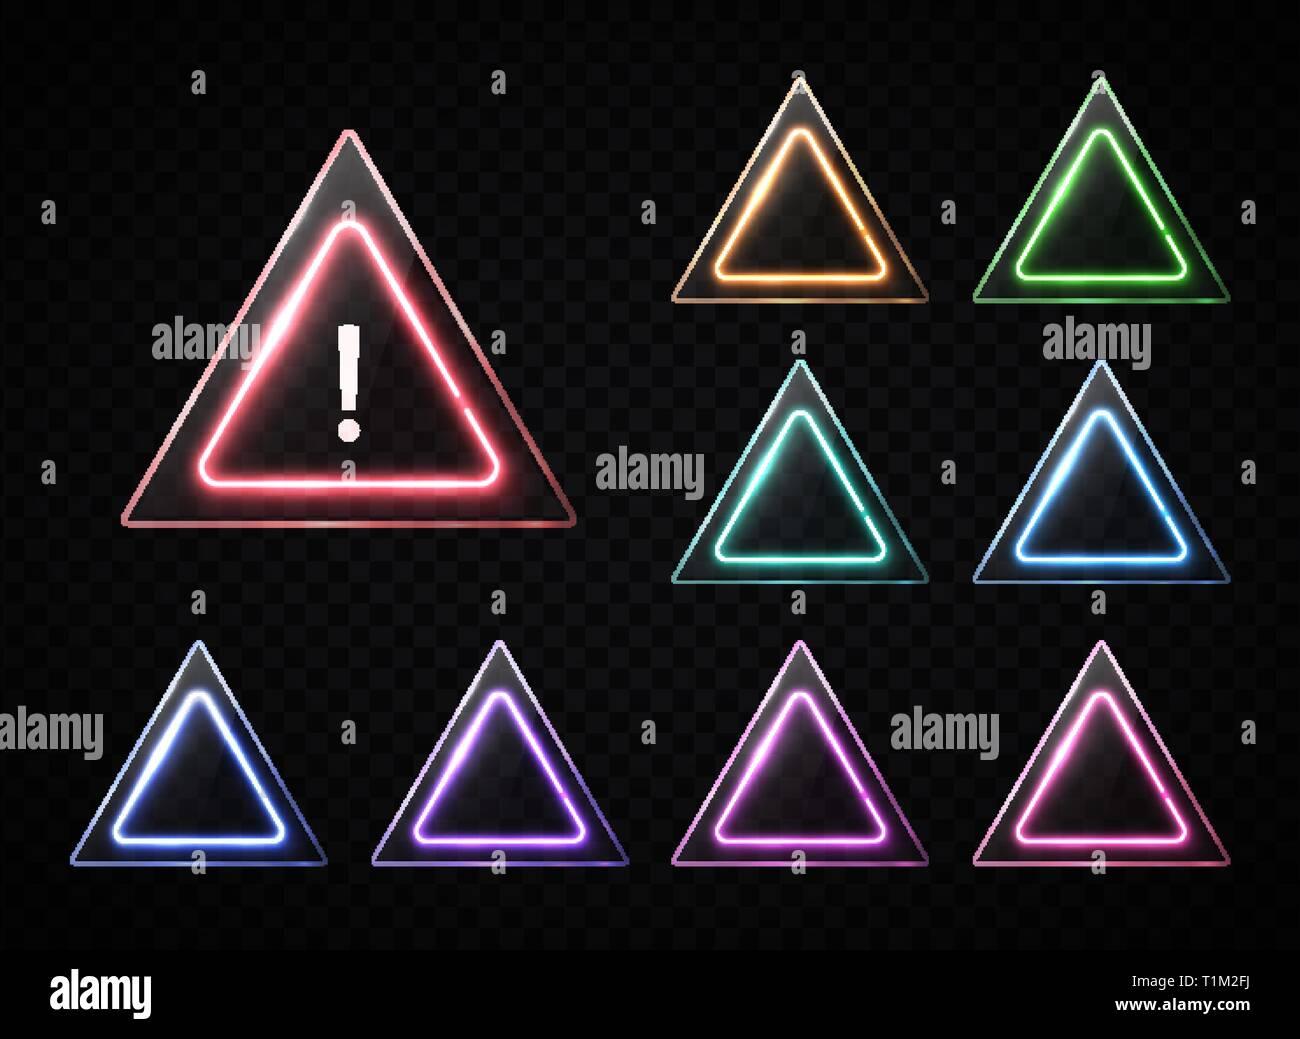 Triangular signs set on transparent background. - Stock Image